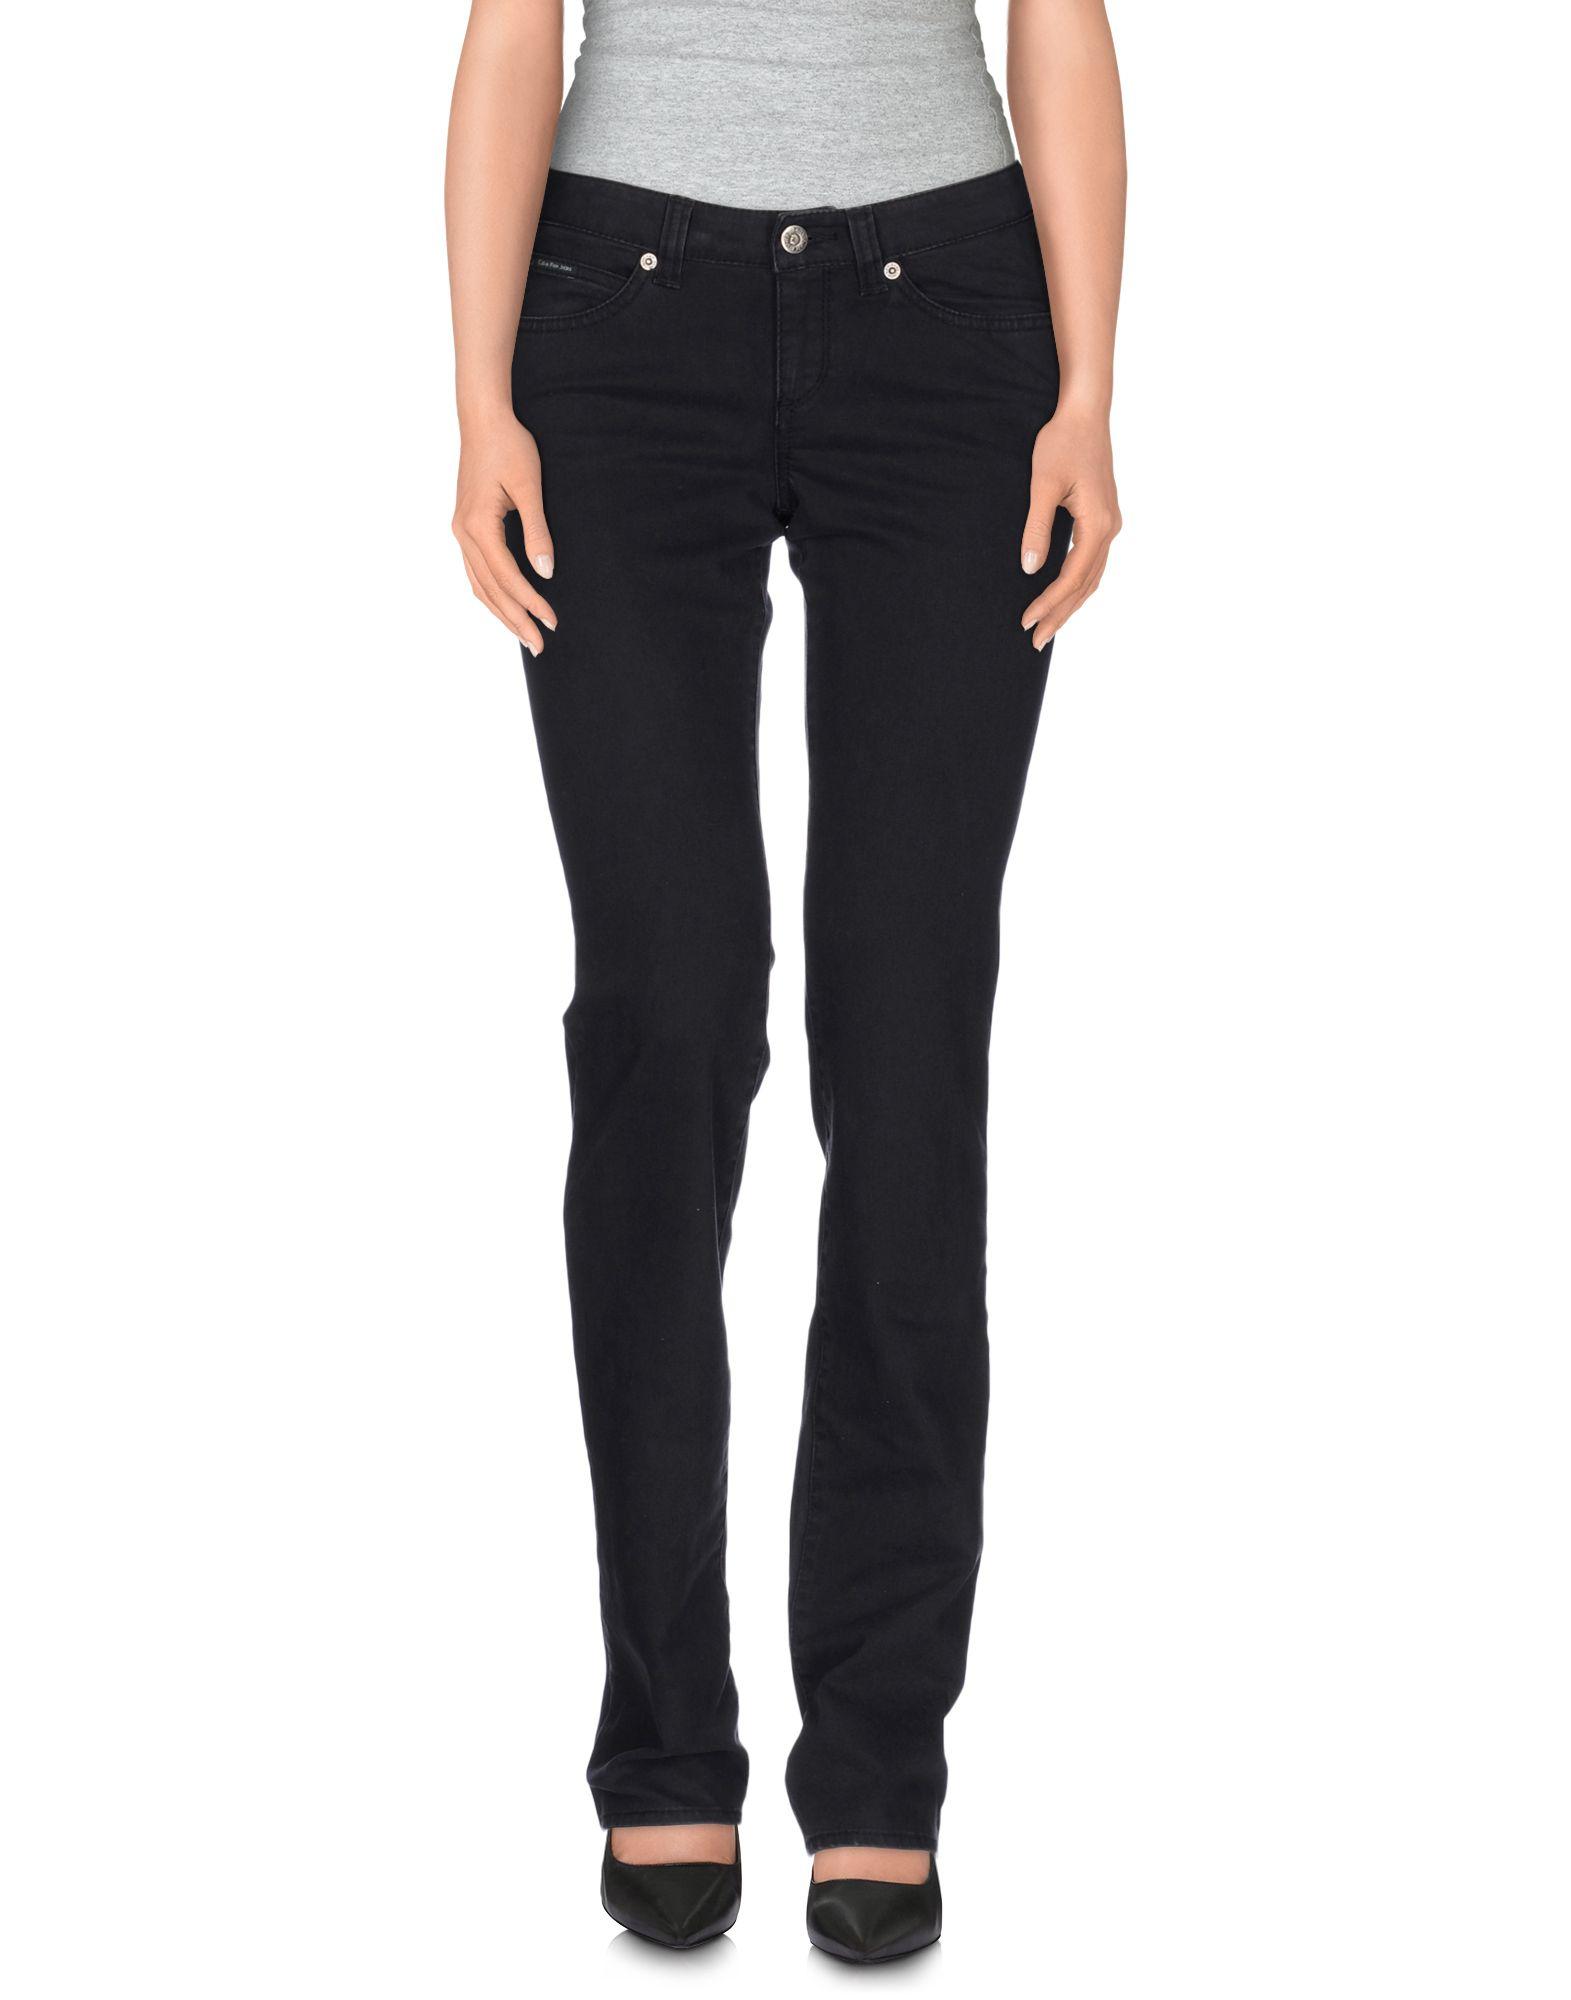 Lyst calvin klein jeans denim trousers in black for Calvin klein jardin collection